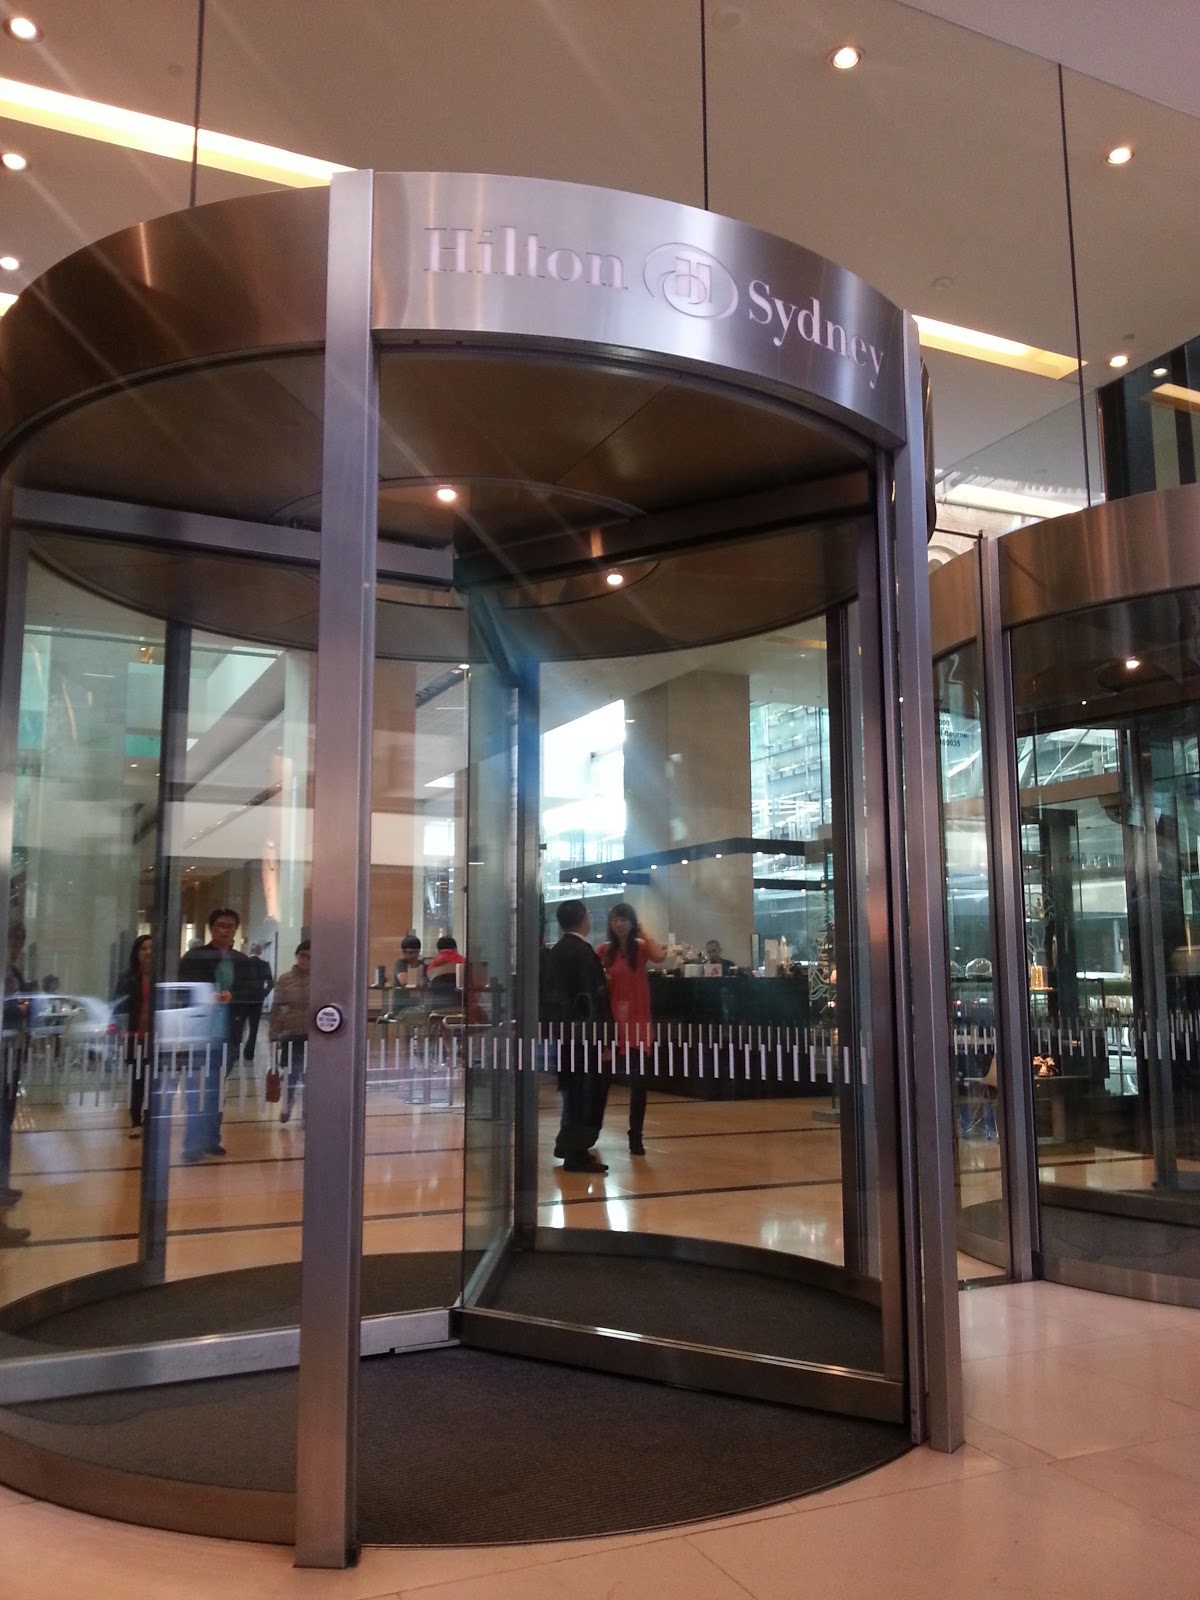 caffe cino hilton hotel sydney australia globalgoodfood. Black Bedroom Furniture Sets. Home Design Ideas